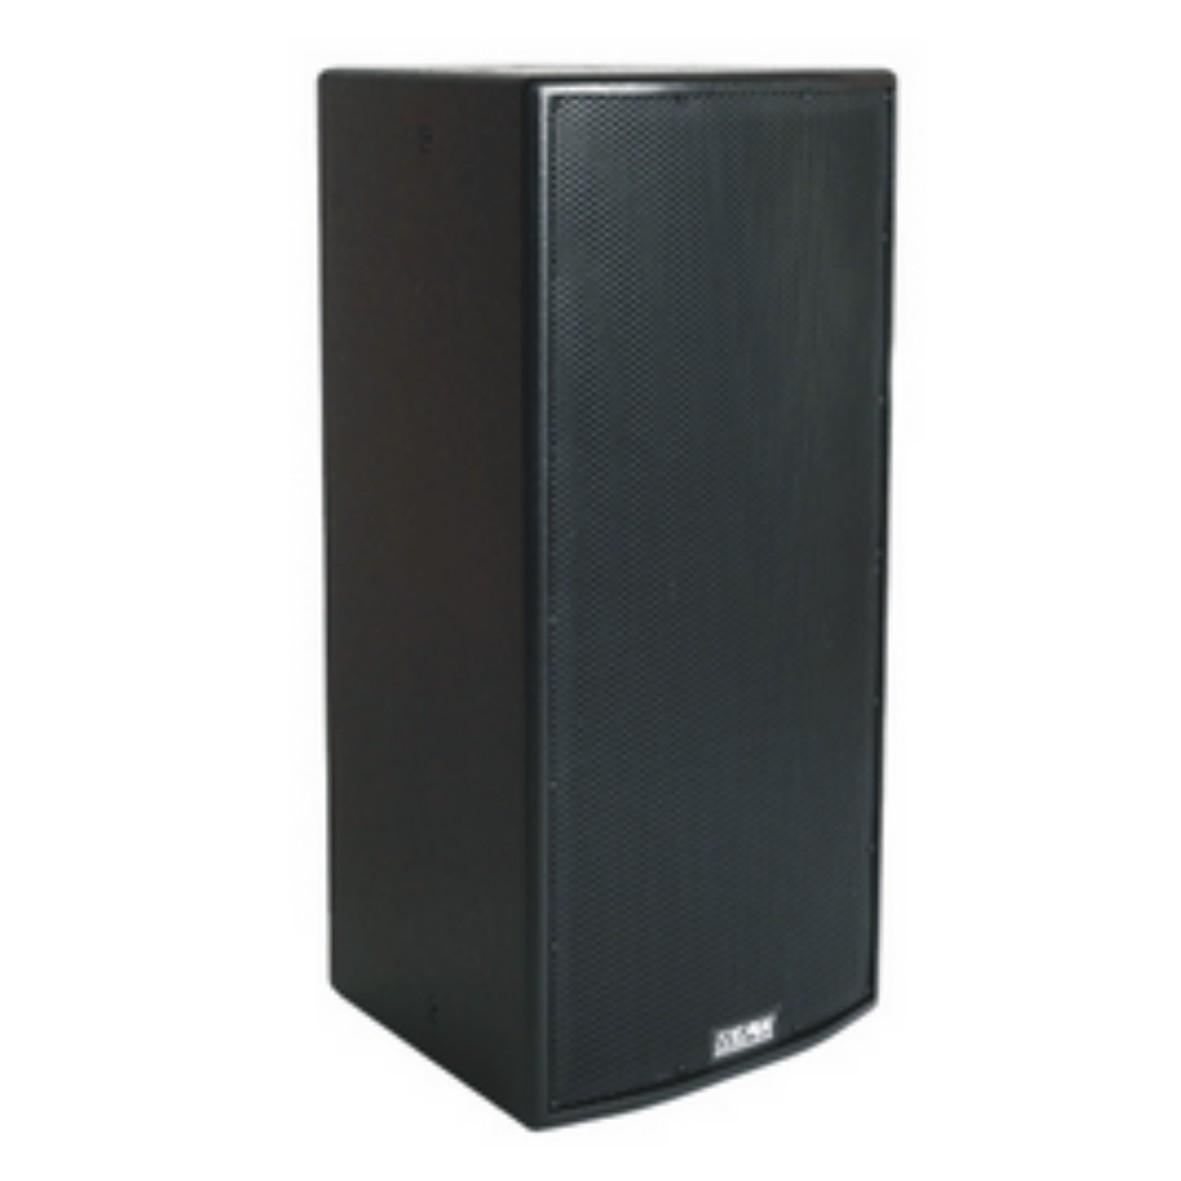 MK2396i 二分频高输出梯形音箱